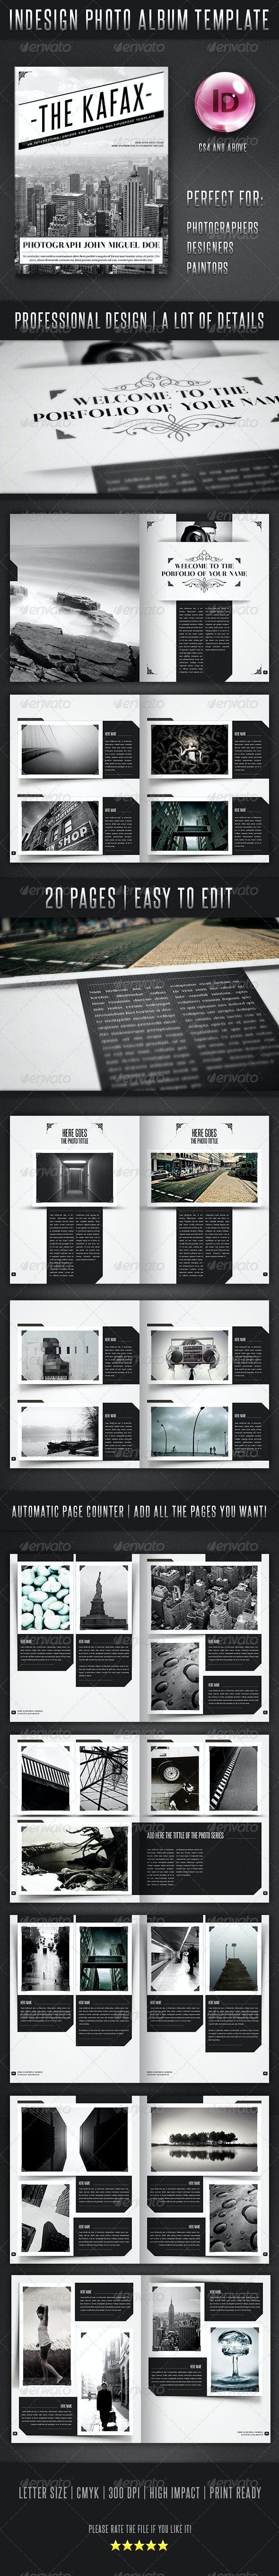 Design Photo Album Template - Photo Albums Print Templates